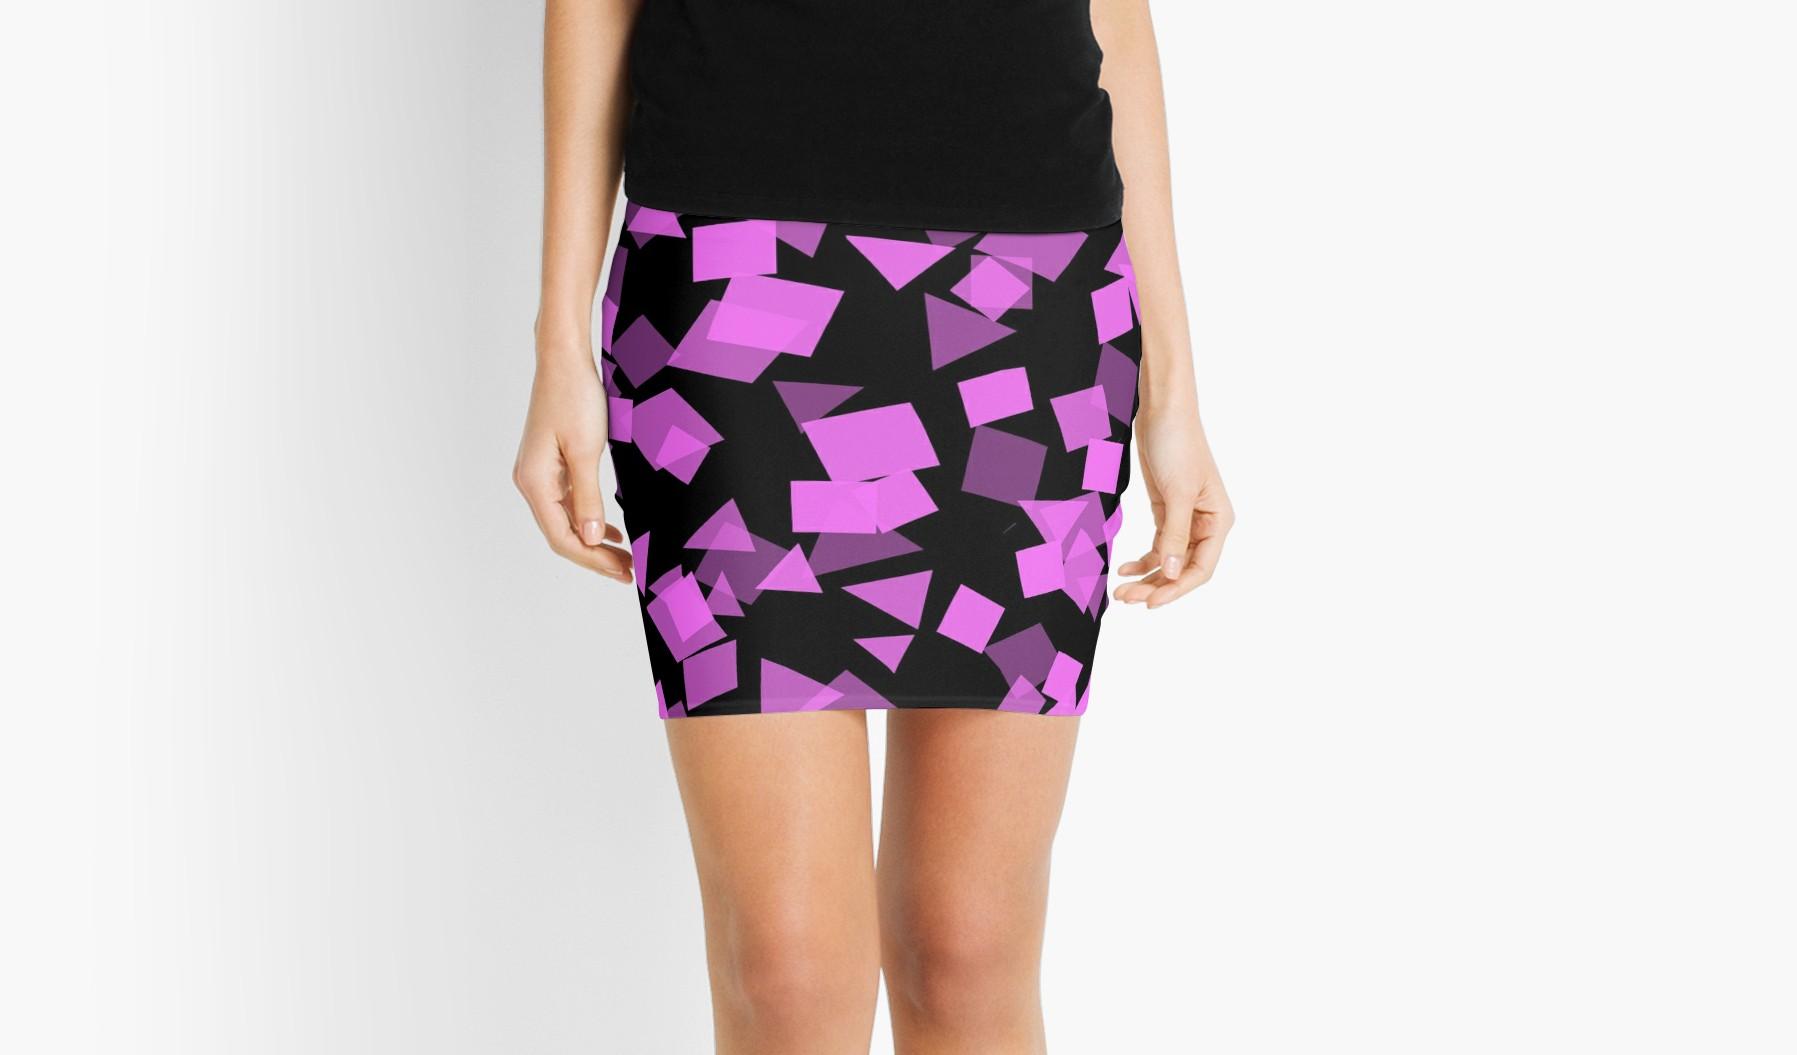 Pink Confetti on Black Stunning by Leatherwood Design a/k/a kahmier